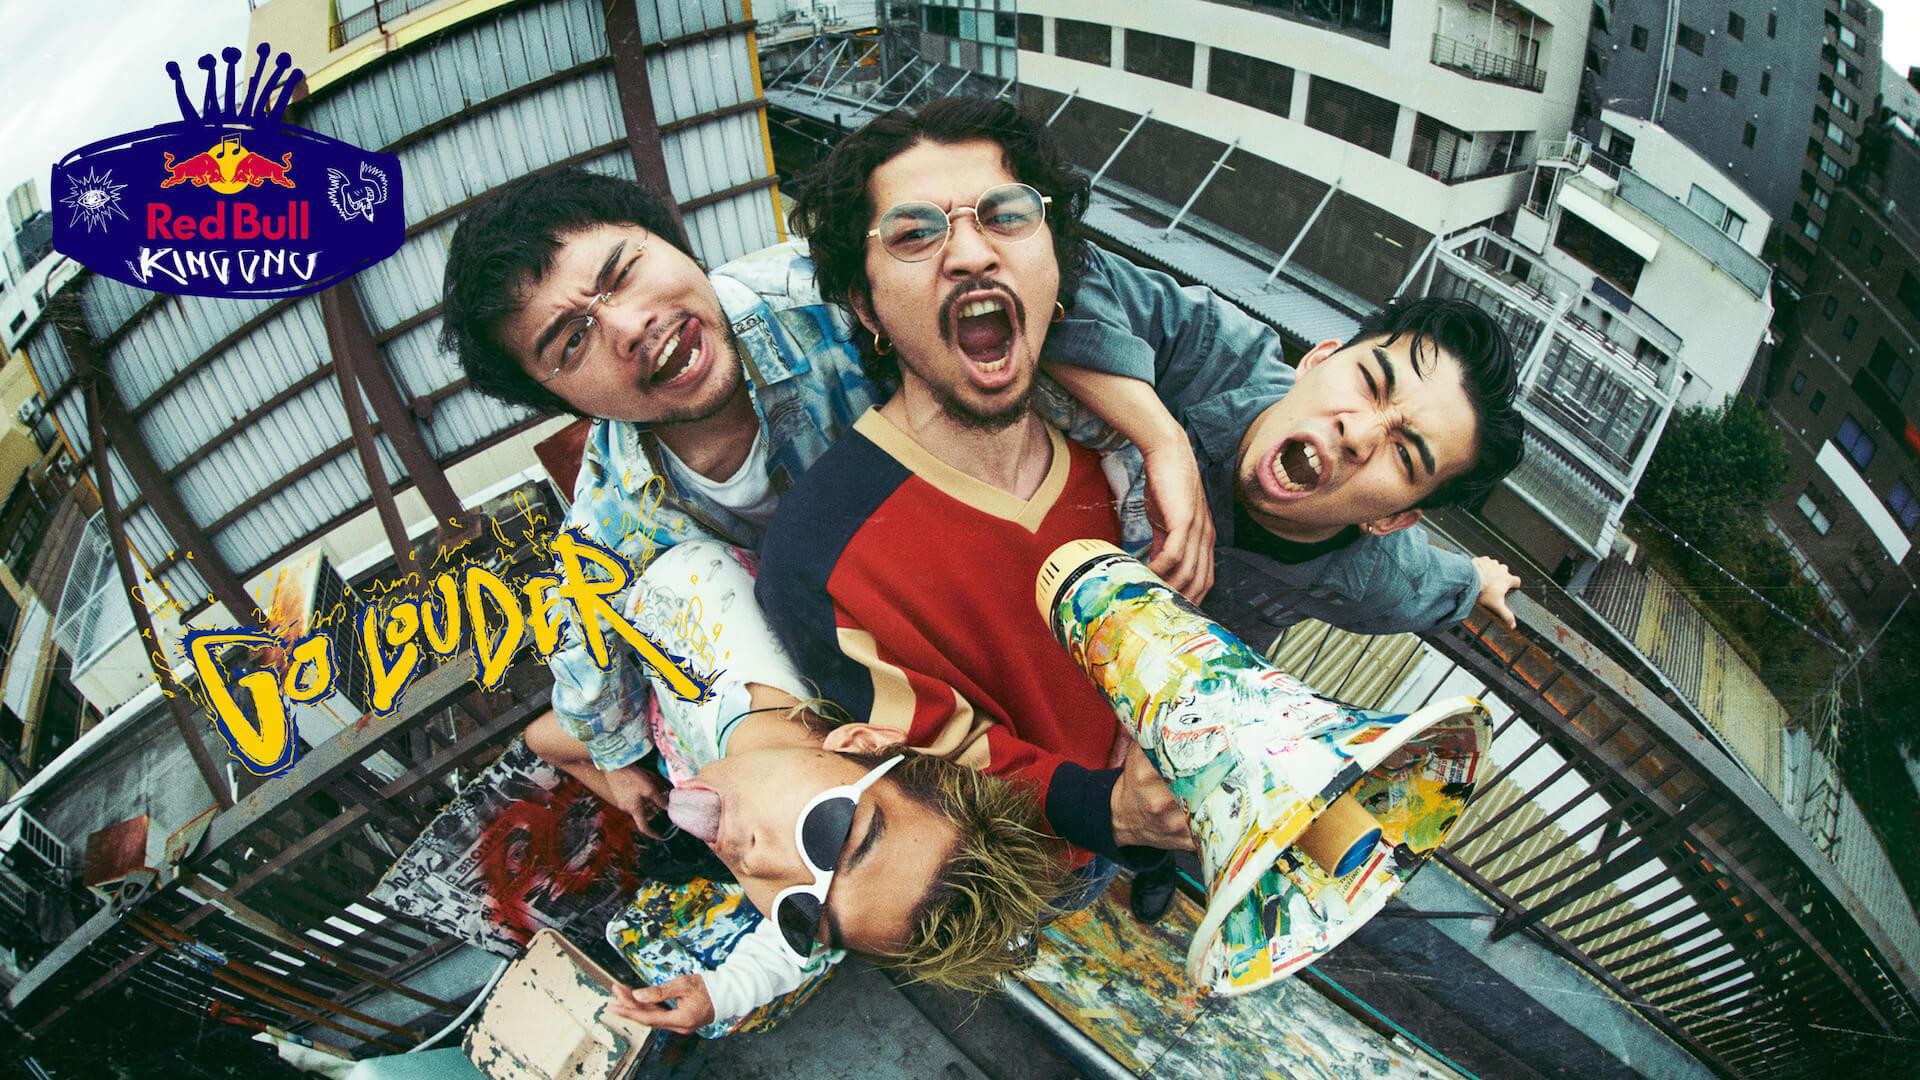 "King Gnuが日本アーティスト史上初めてRed Bullとパートナーシップを締結!""Go Louder""プロジェクトでインタビュー公開&コラボグッズプレゼントも music200908_kinggnu_redbull_2"